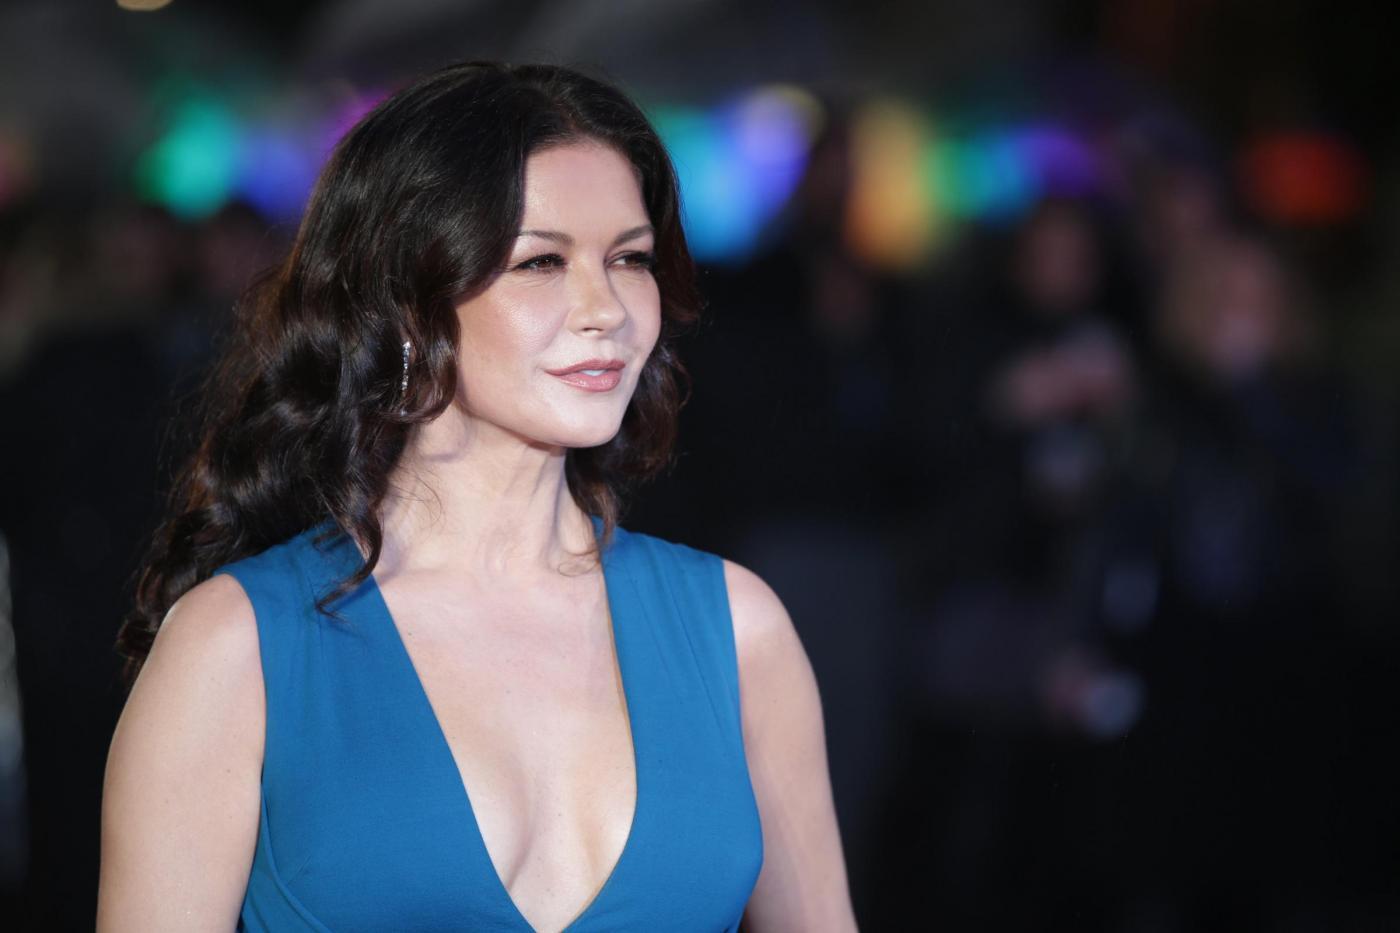 Catherine Zeta Jones, scollatura e spacco estremo6